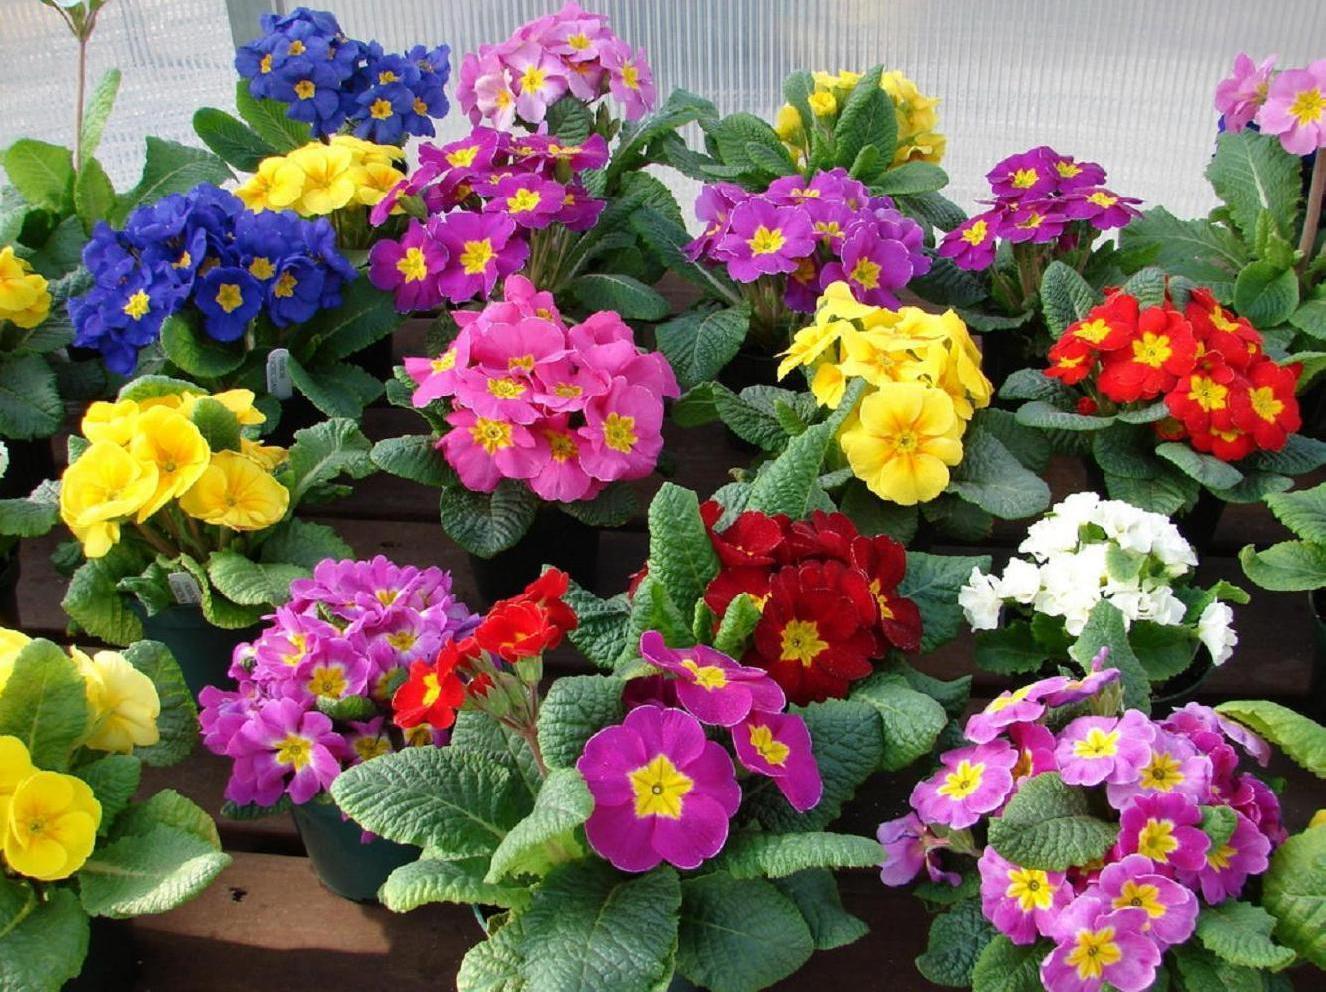 Примула выращивание в домашних условиях фото